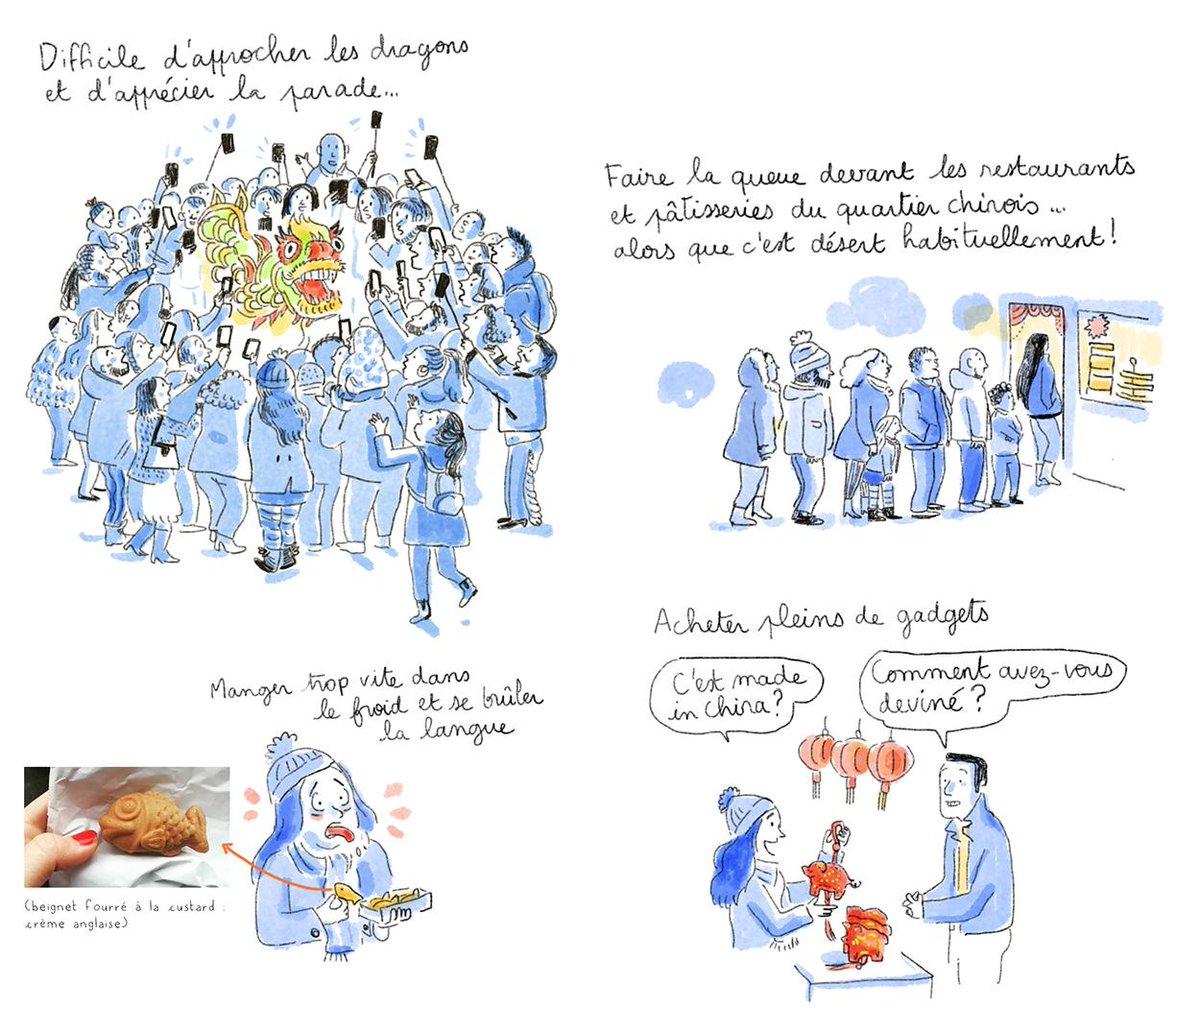 Blog Angleterre. Nouvel An chinois à Londres https://t.co/N5kKGuuTzo #expats #Londres